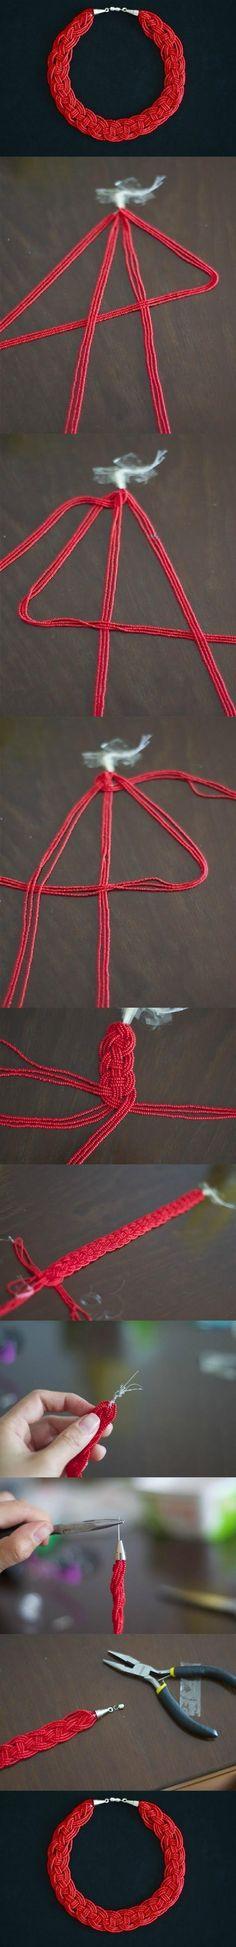 DIY Simple Bead Necklace DIY Projects | UsefulDIY.com Follow Us on Facebook ==> http://www.facebook.com/UsefulDiy